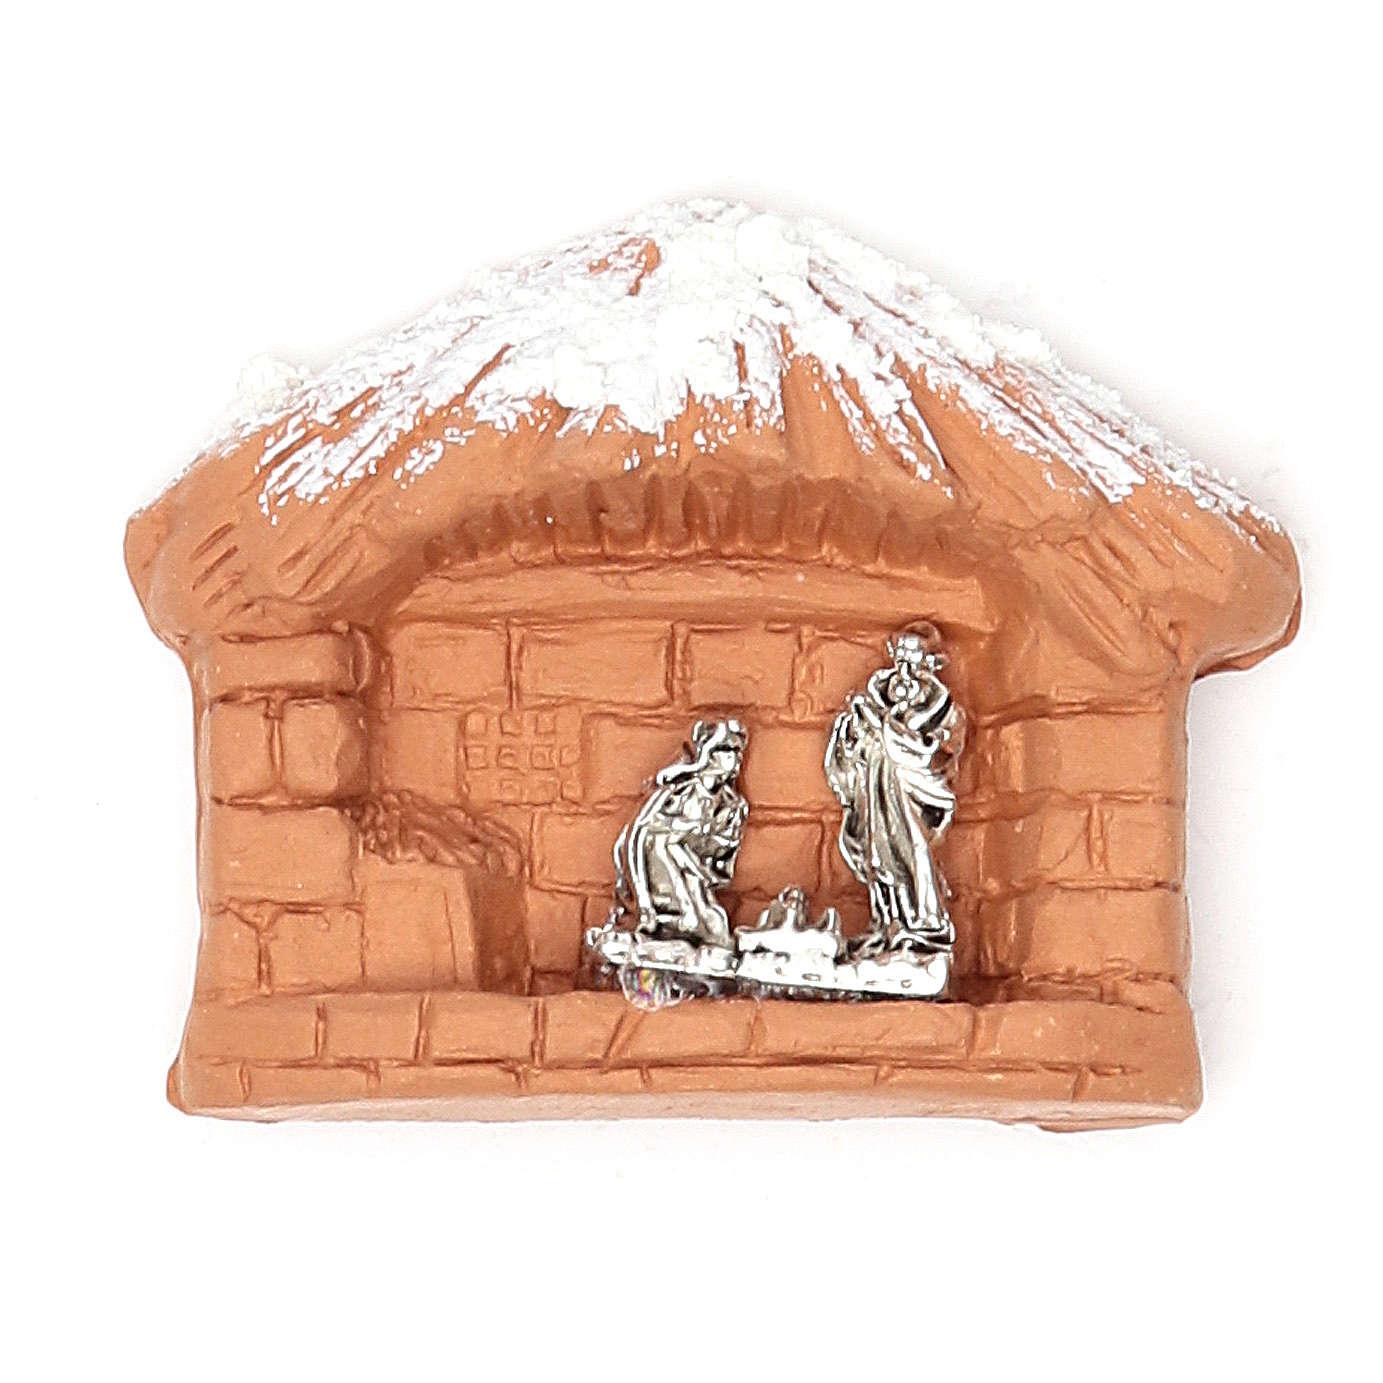 Calamita terracotta Natività 3